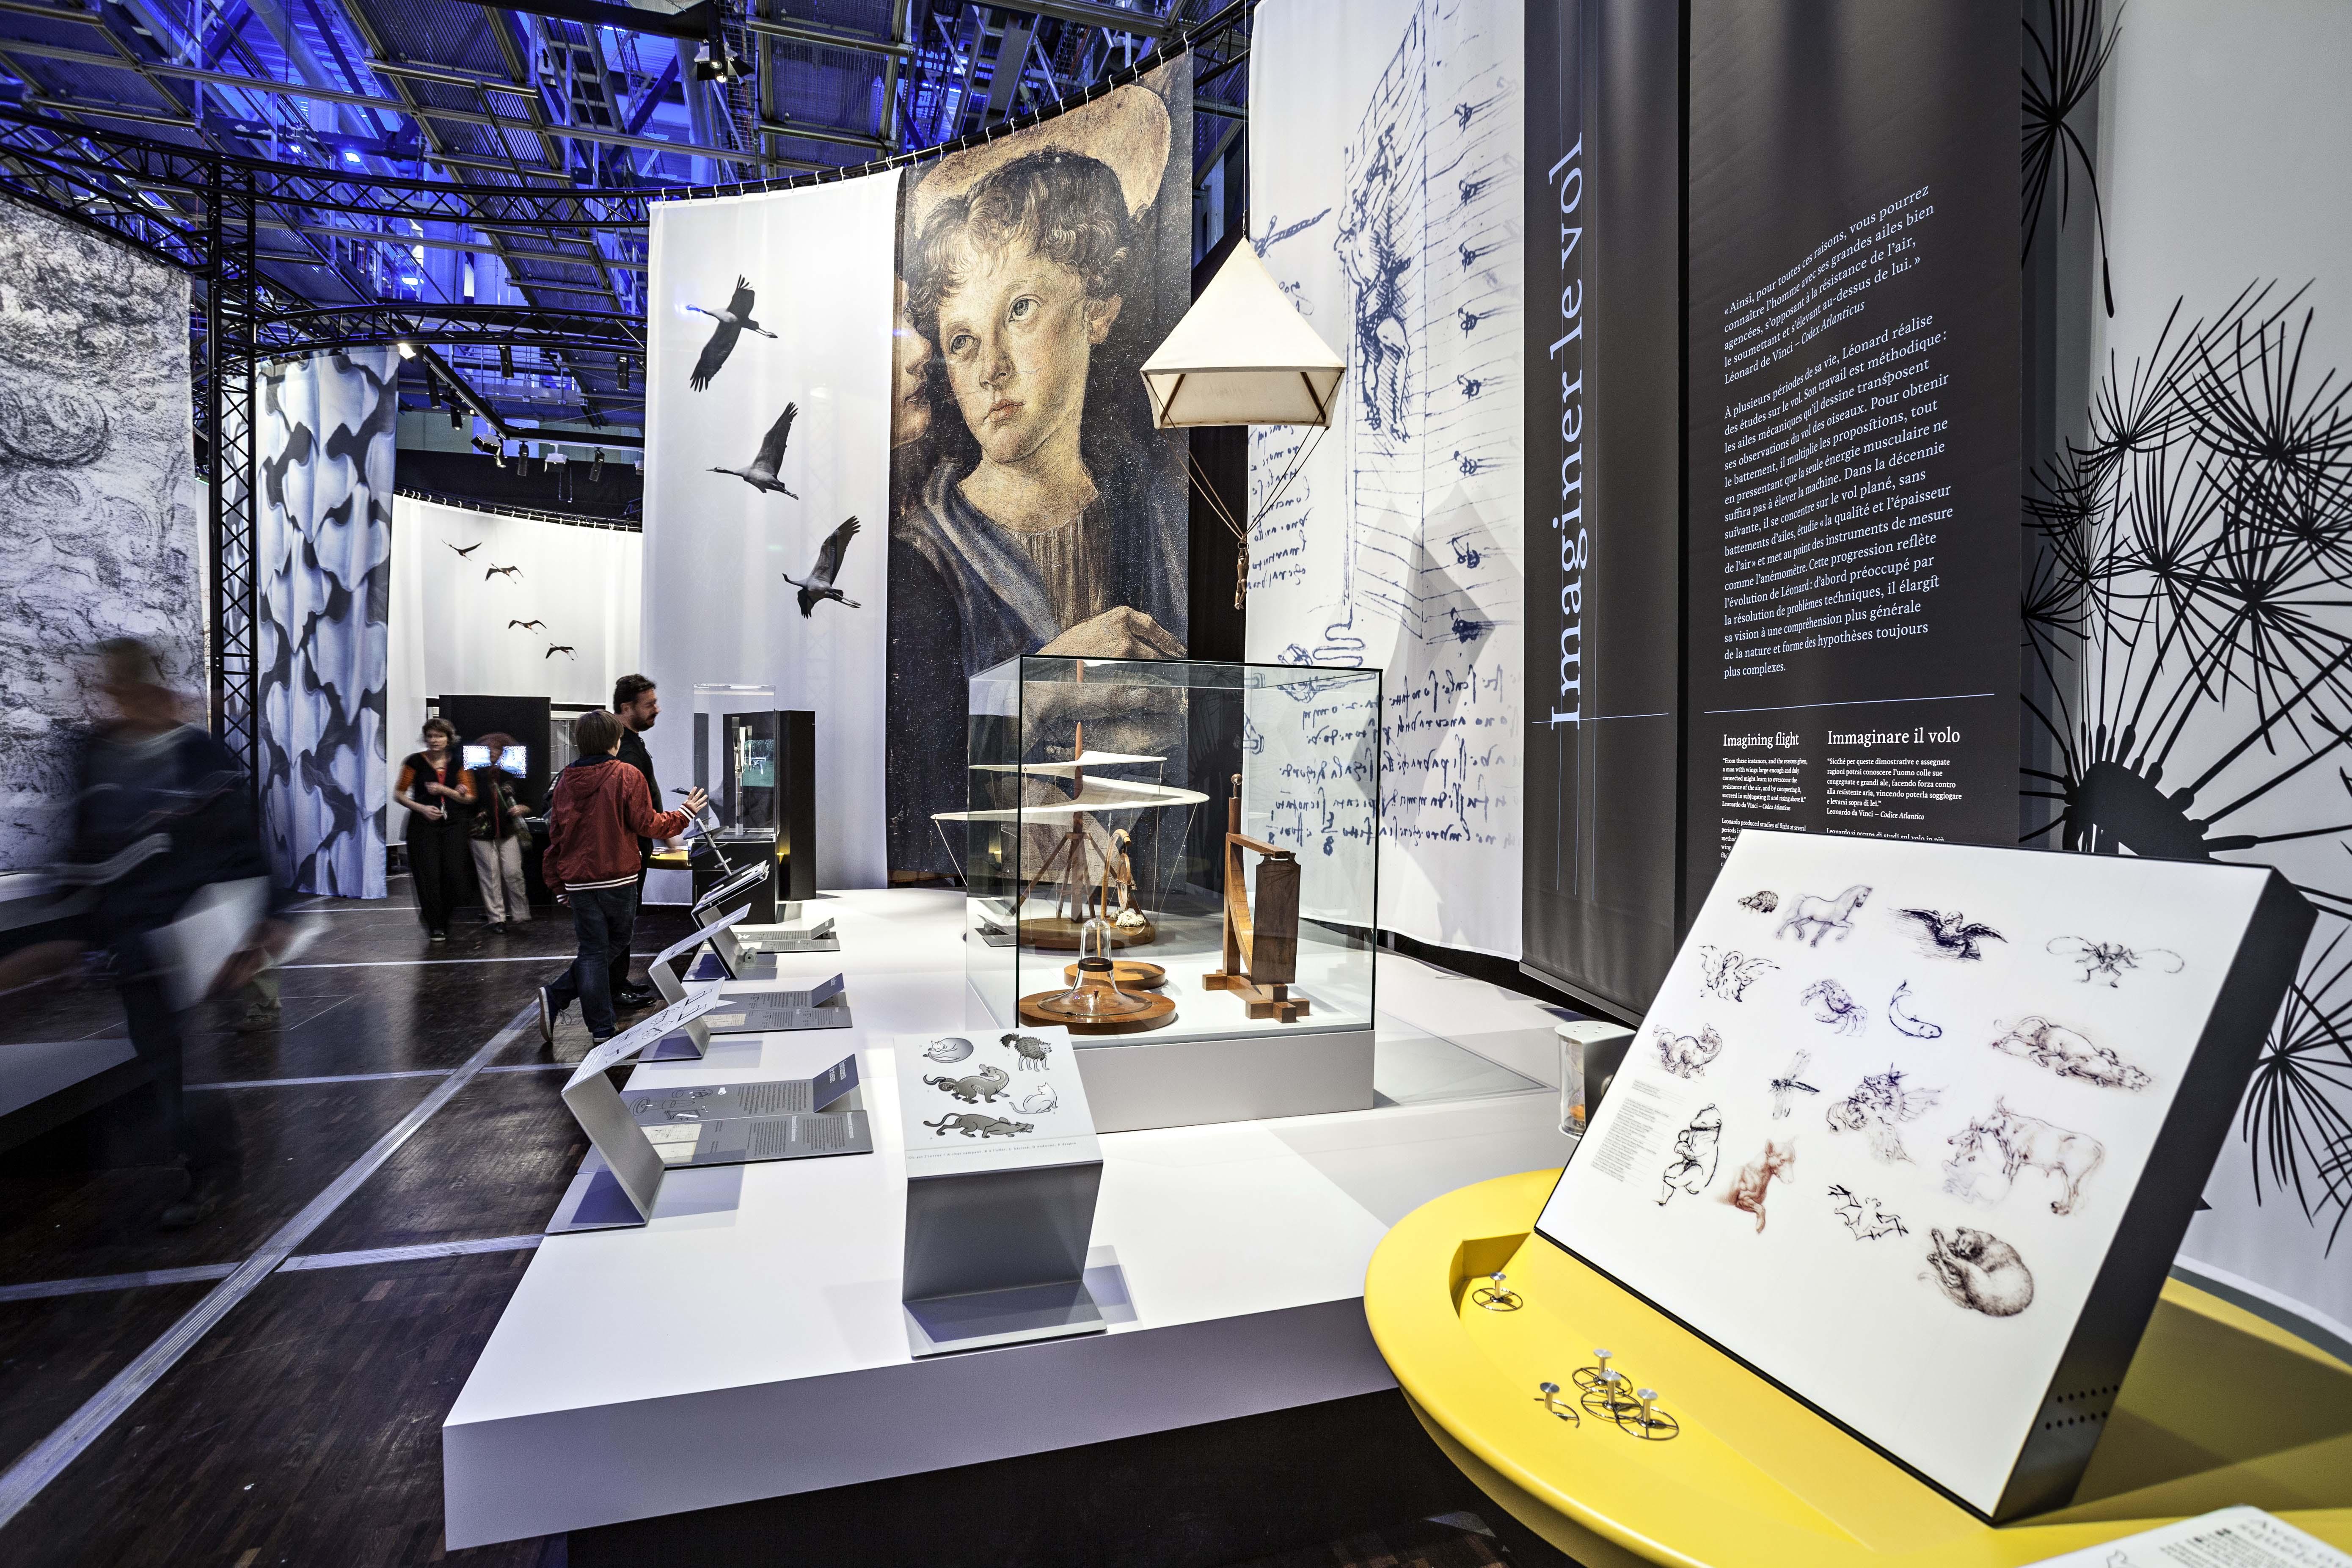 Leonardo D Exhibition : Fascinating leonardo da vinci exhibition opens at science museum